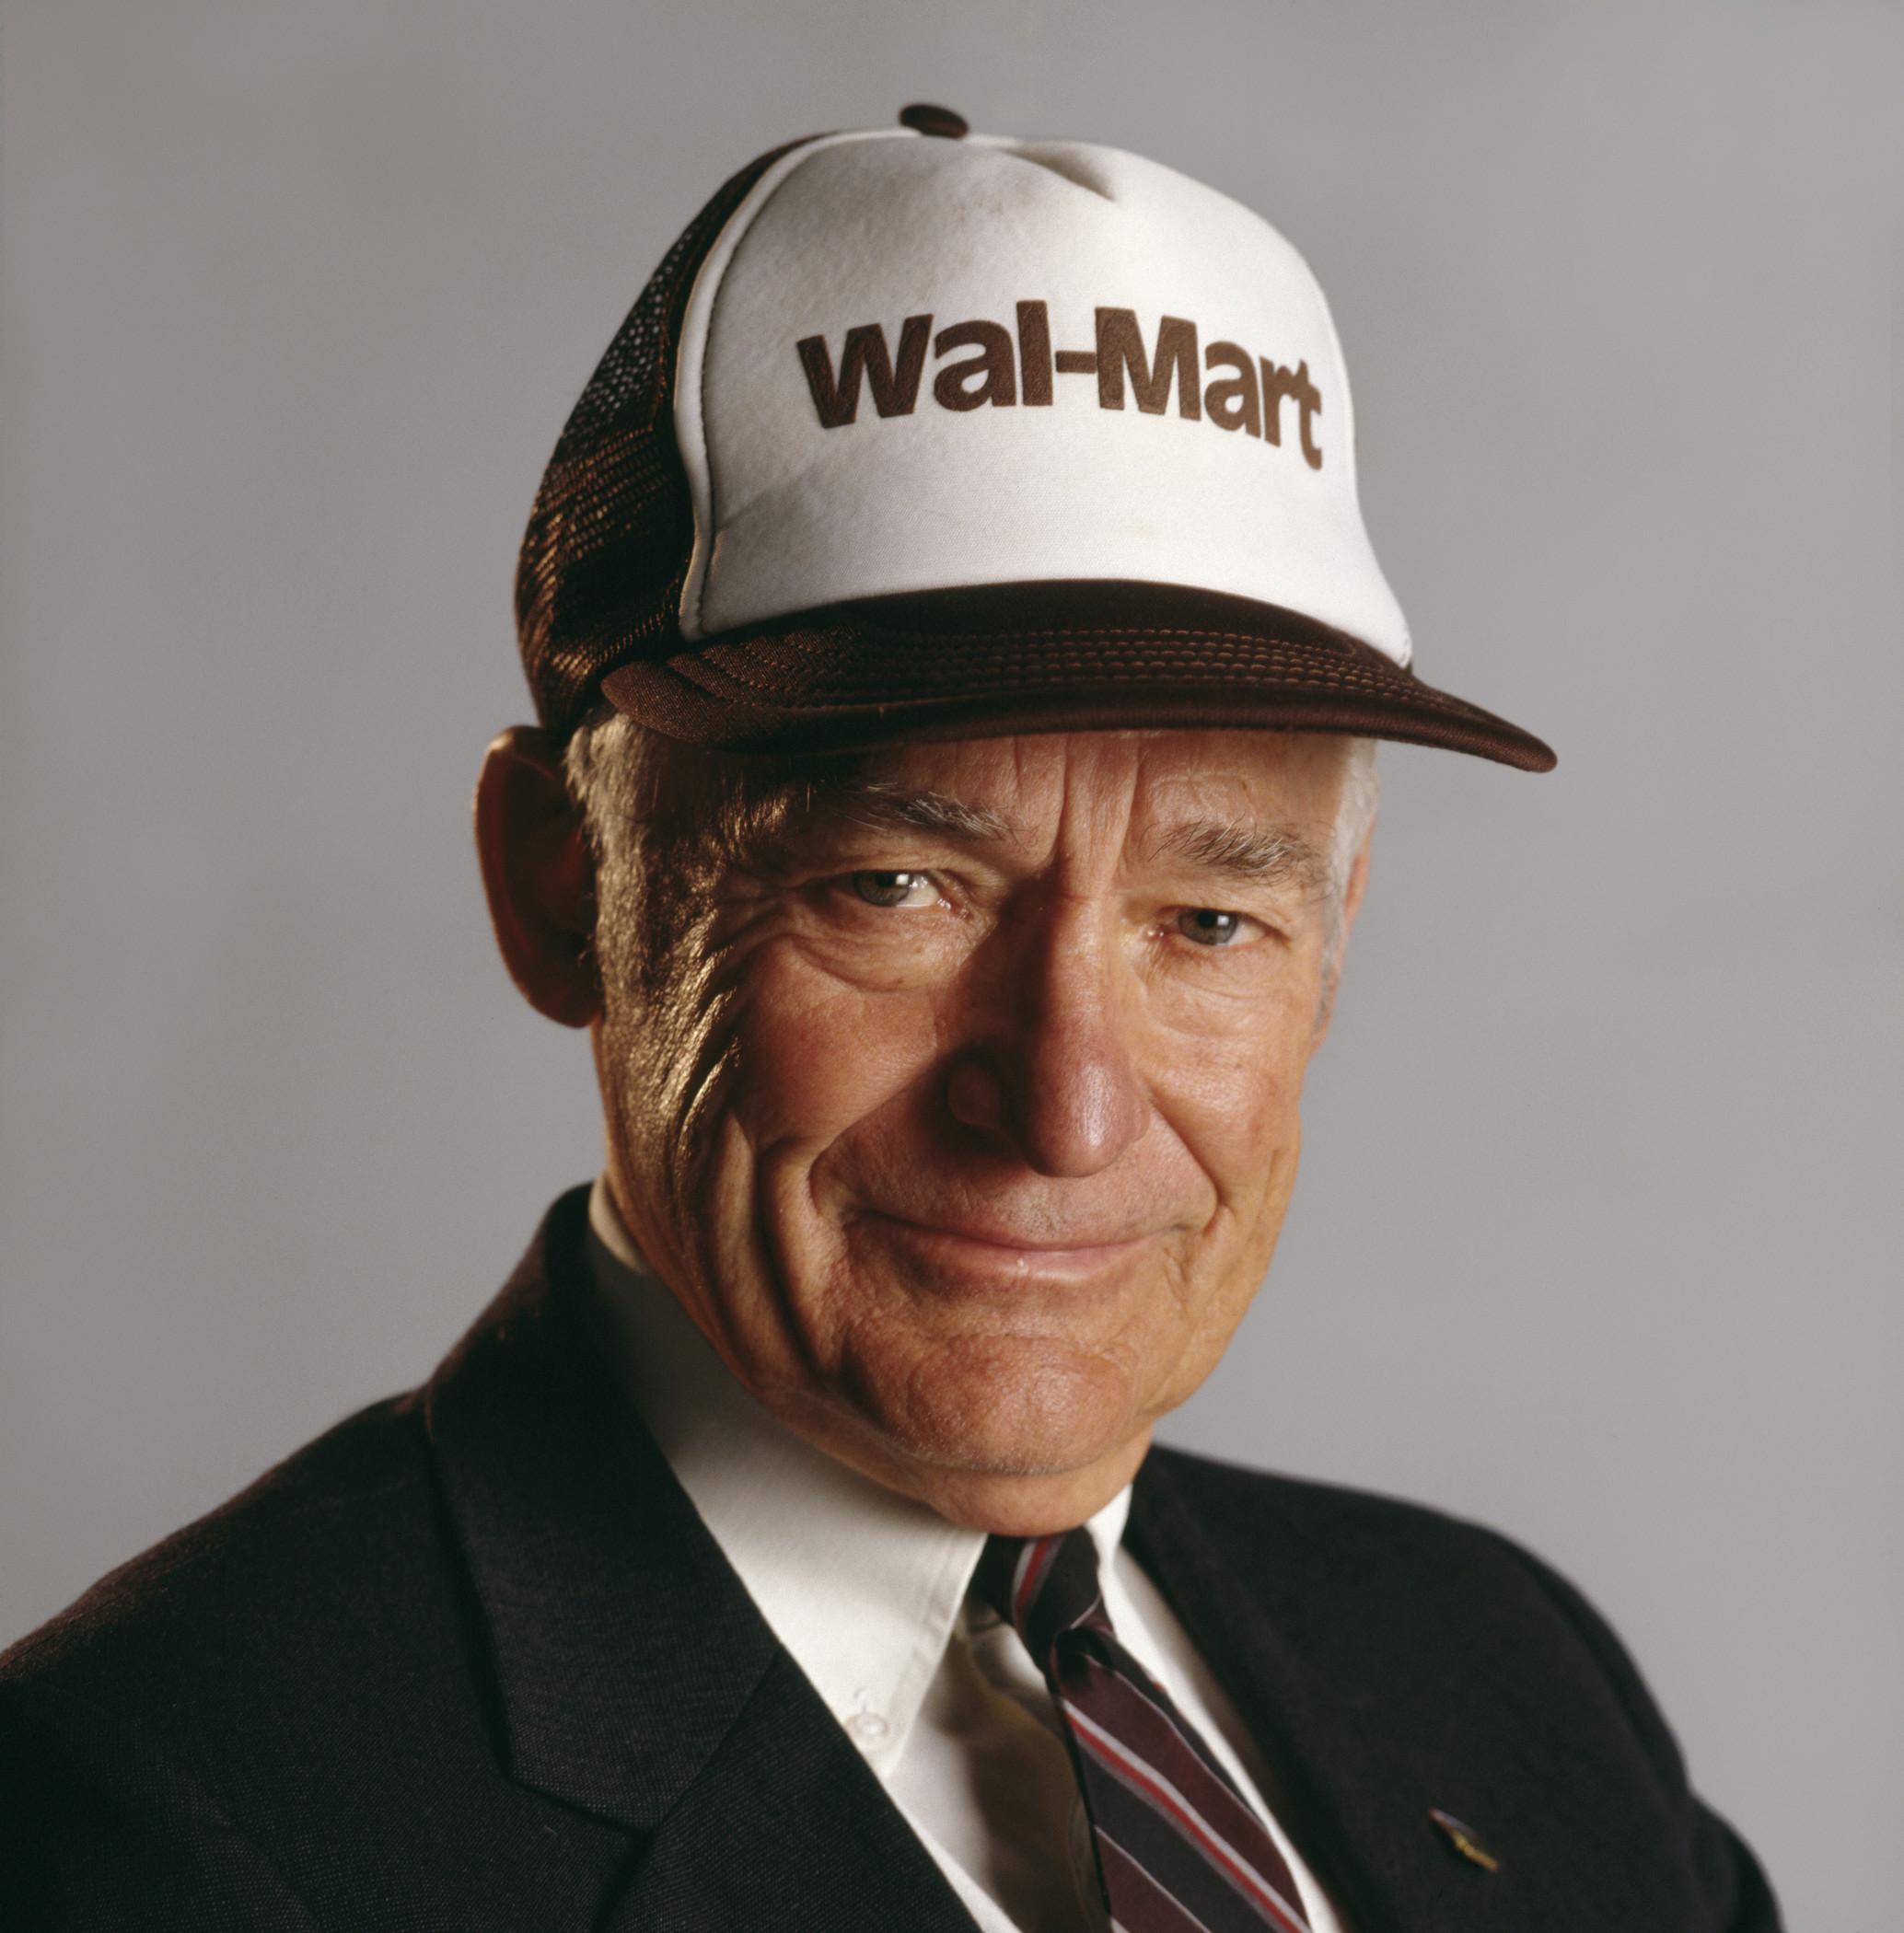 Wisdom from Wal-Mart — David Perell